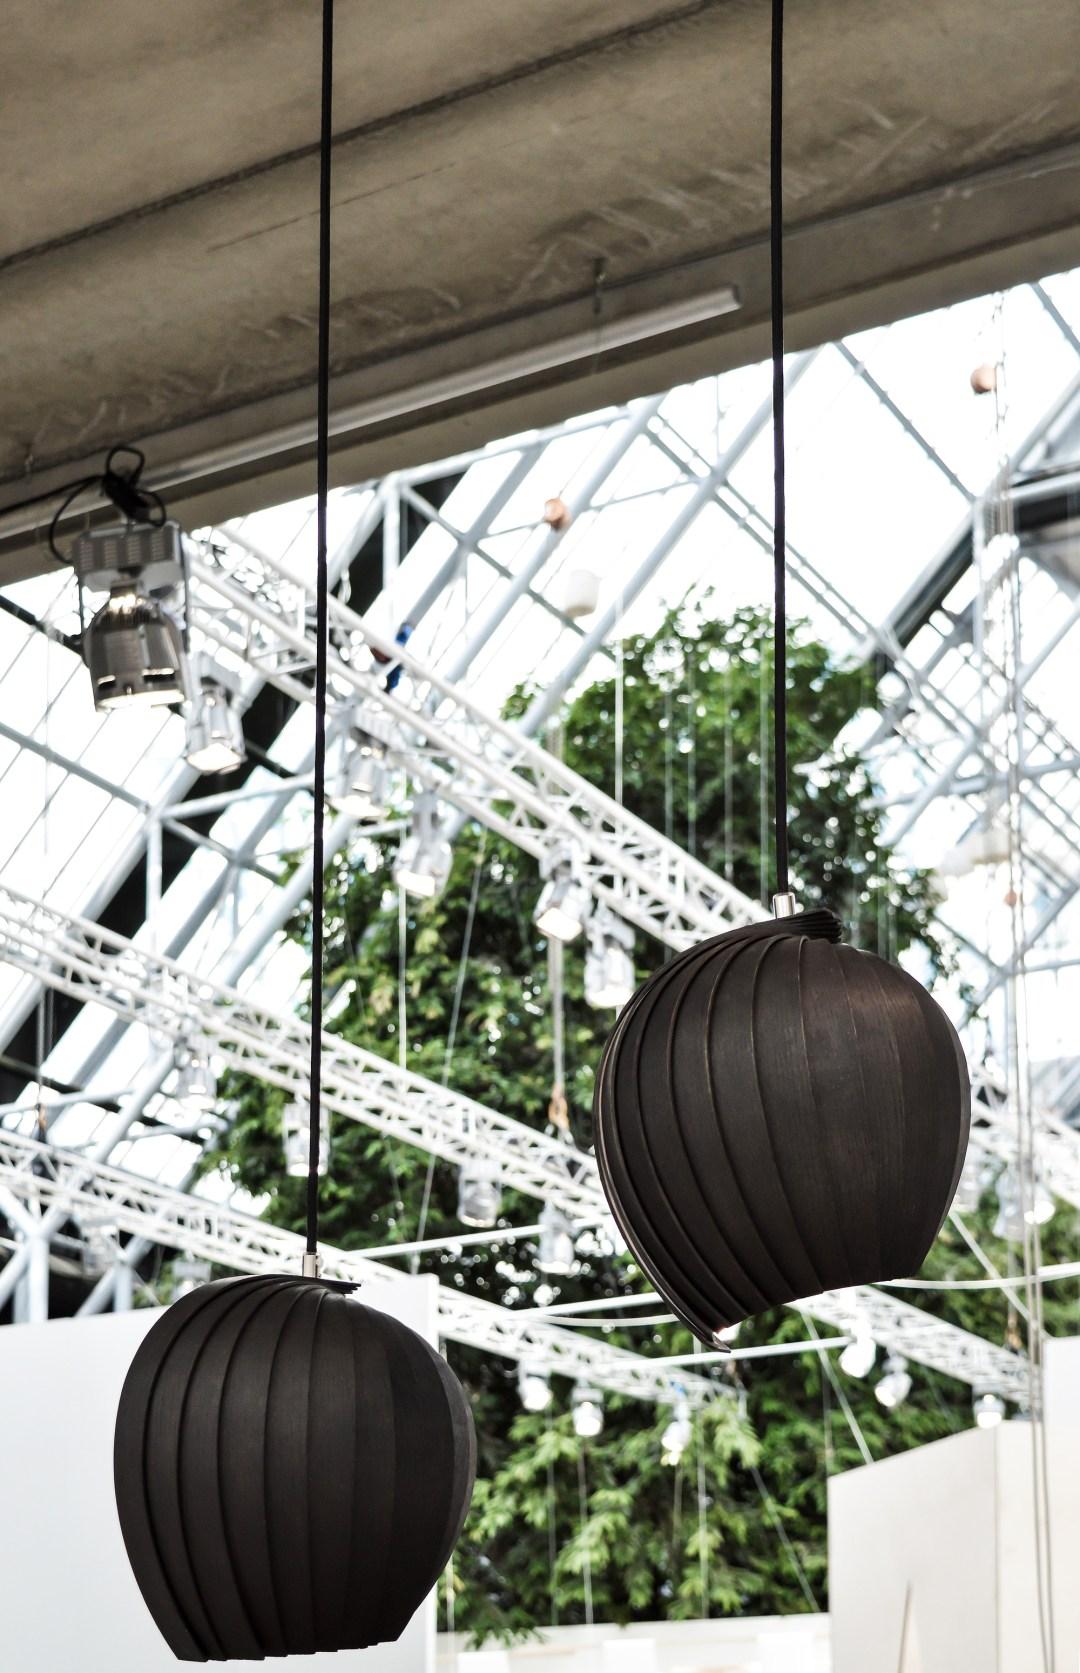 The kovac family - northmodern vol 4, Copenhagen design show